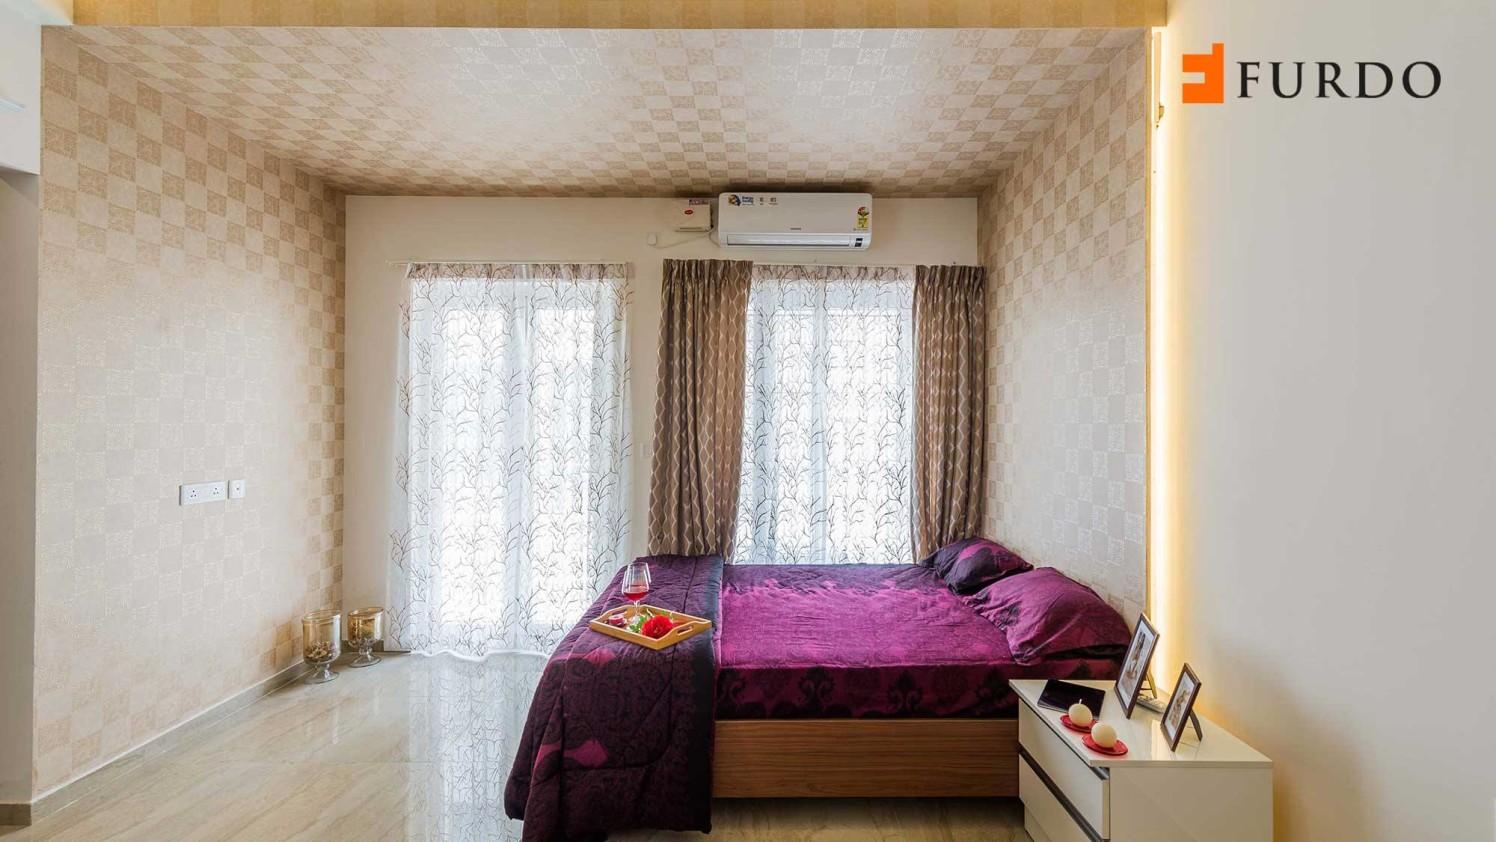 Bedroom With Artistic Wall Lighting by Furdo.com Bedroom Contemporary | Interior Design Photos & Ideas